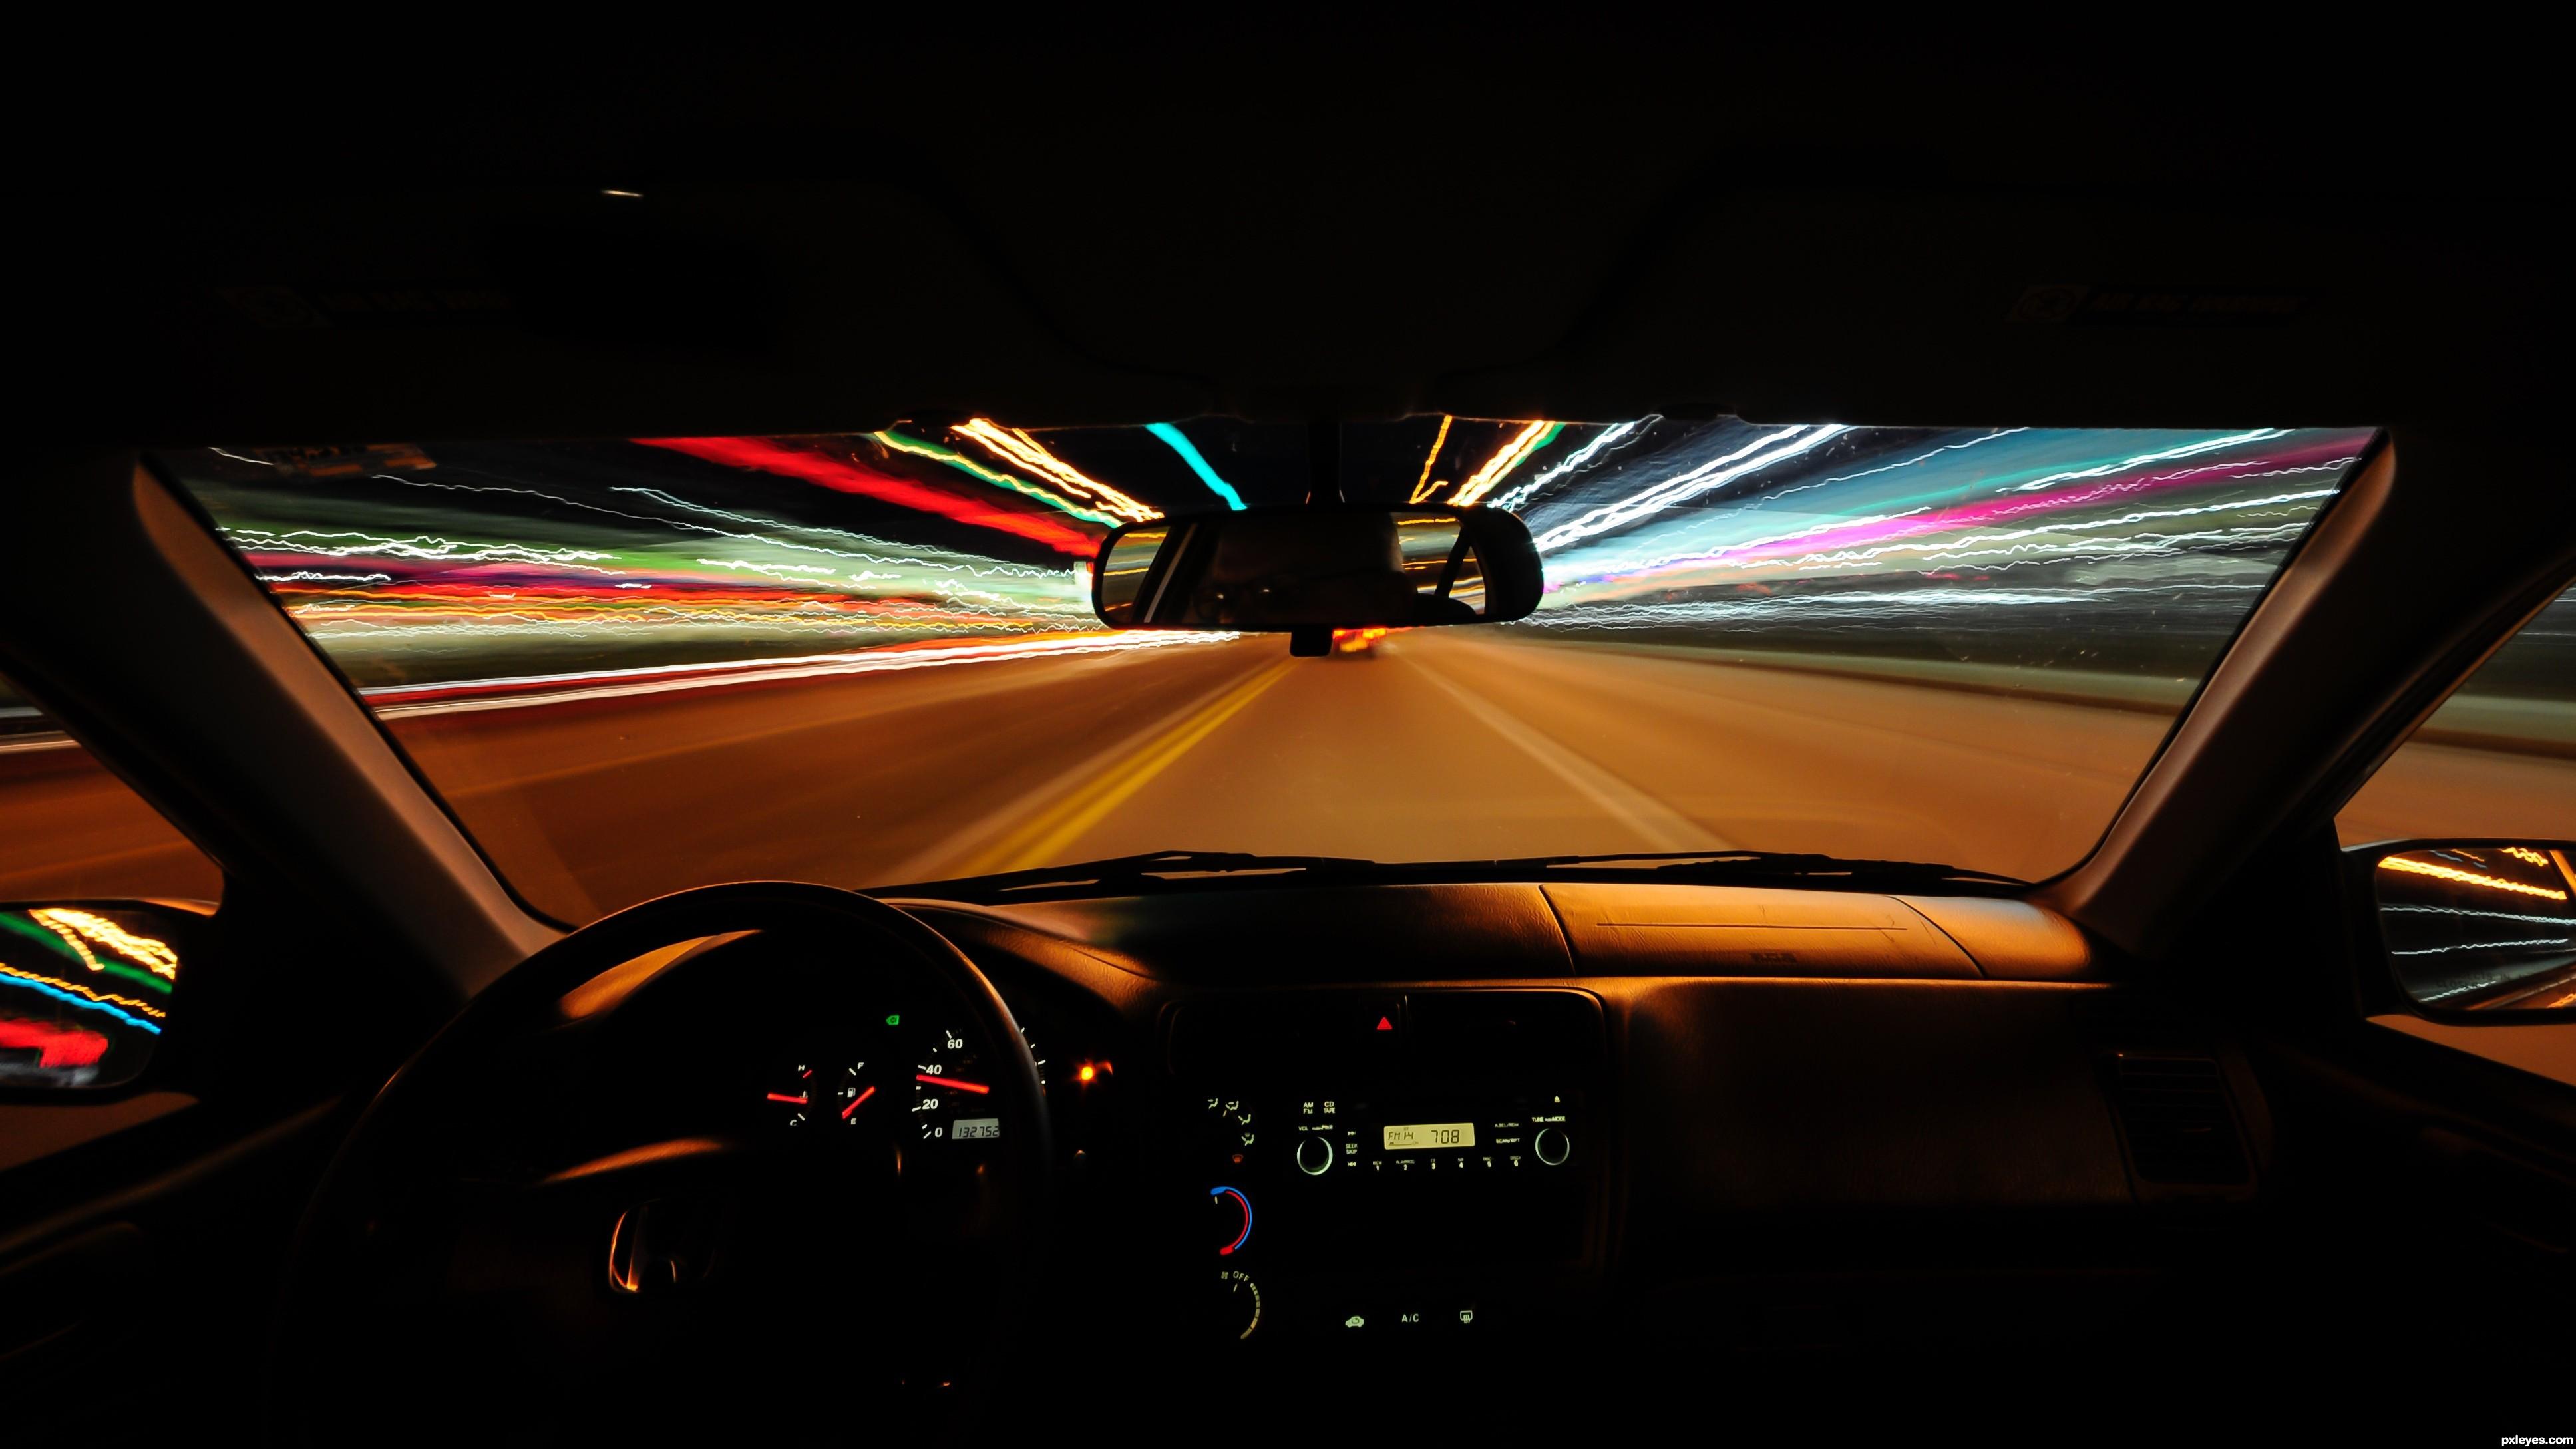 Night drive picture by bjschneider for long exposure night night drive stopboris Gallery